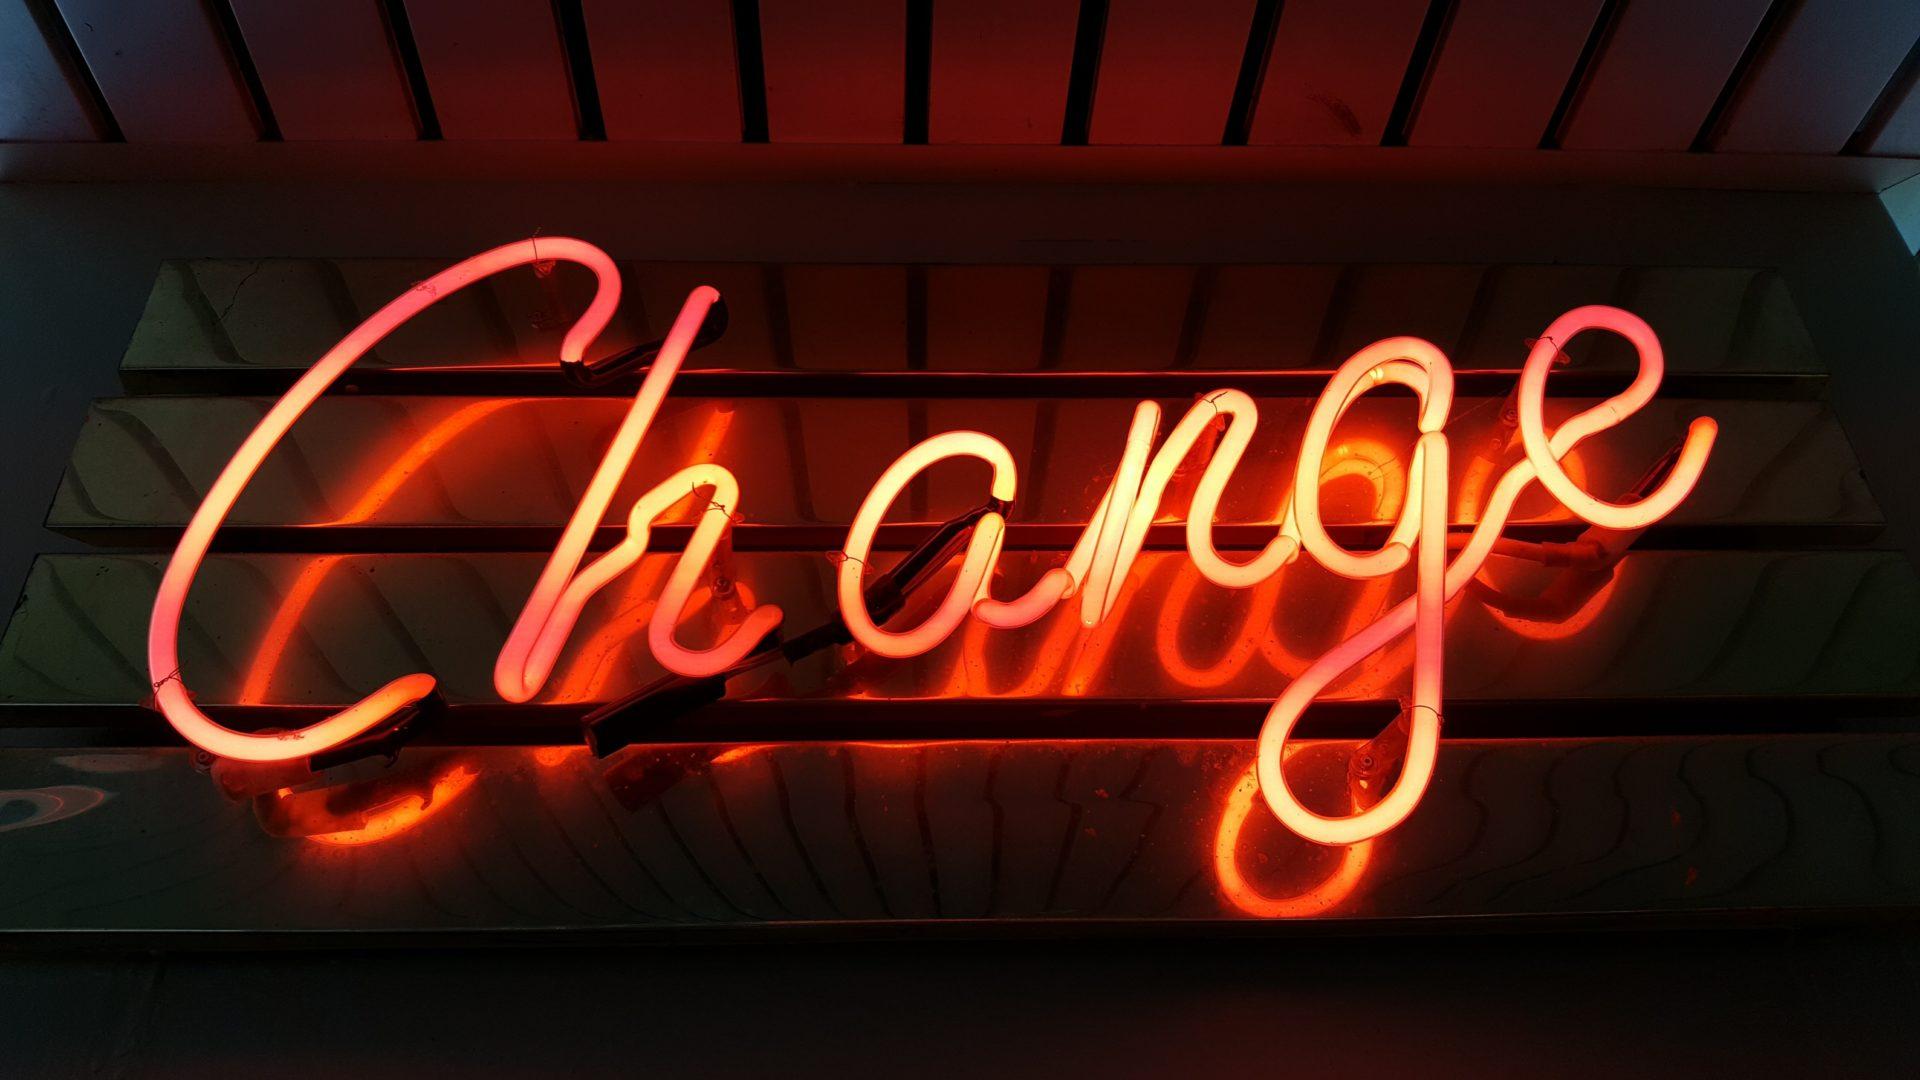 Neon verlichting change